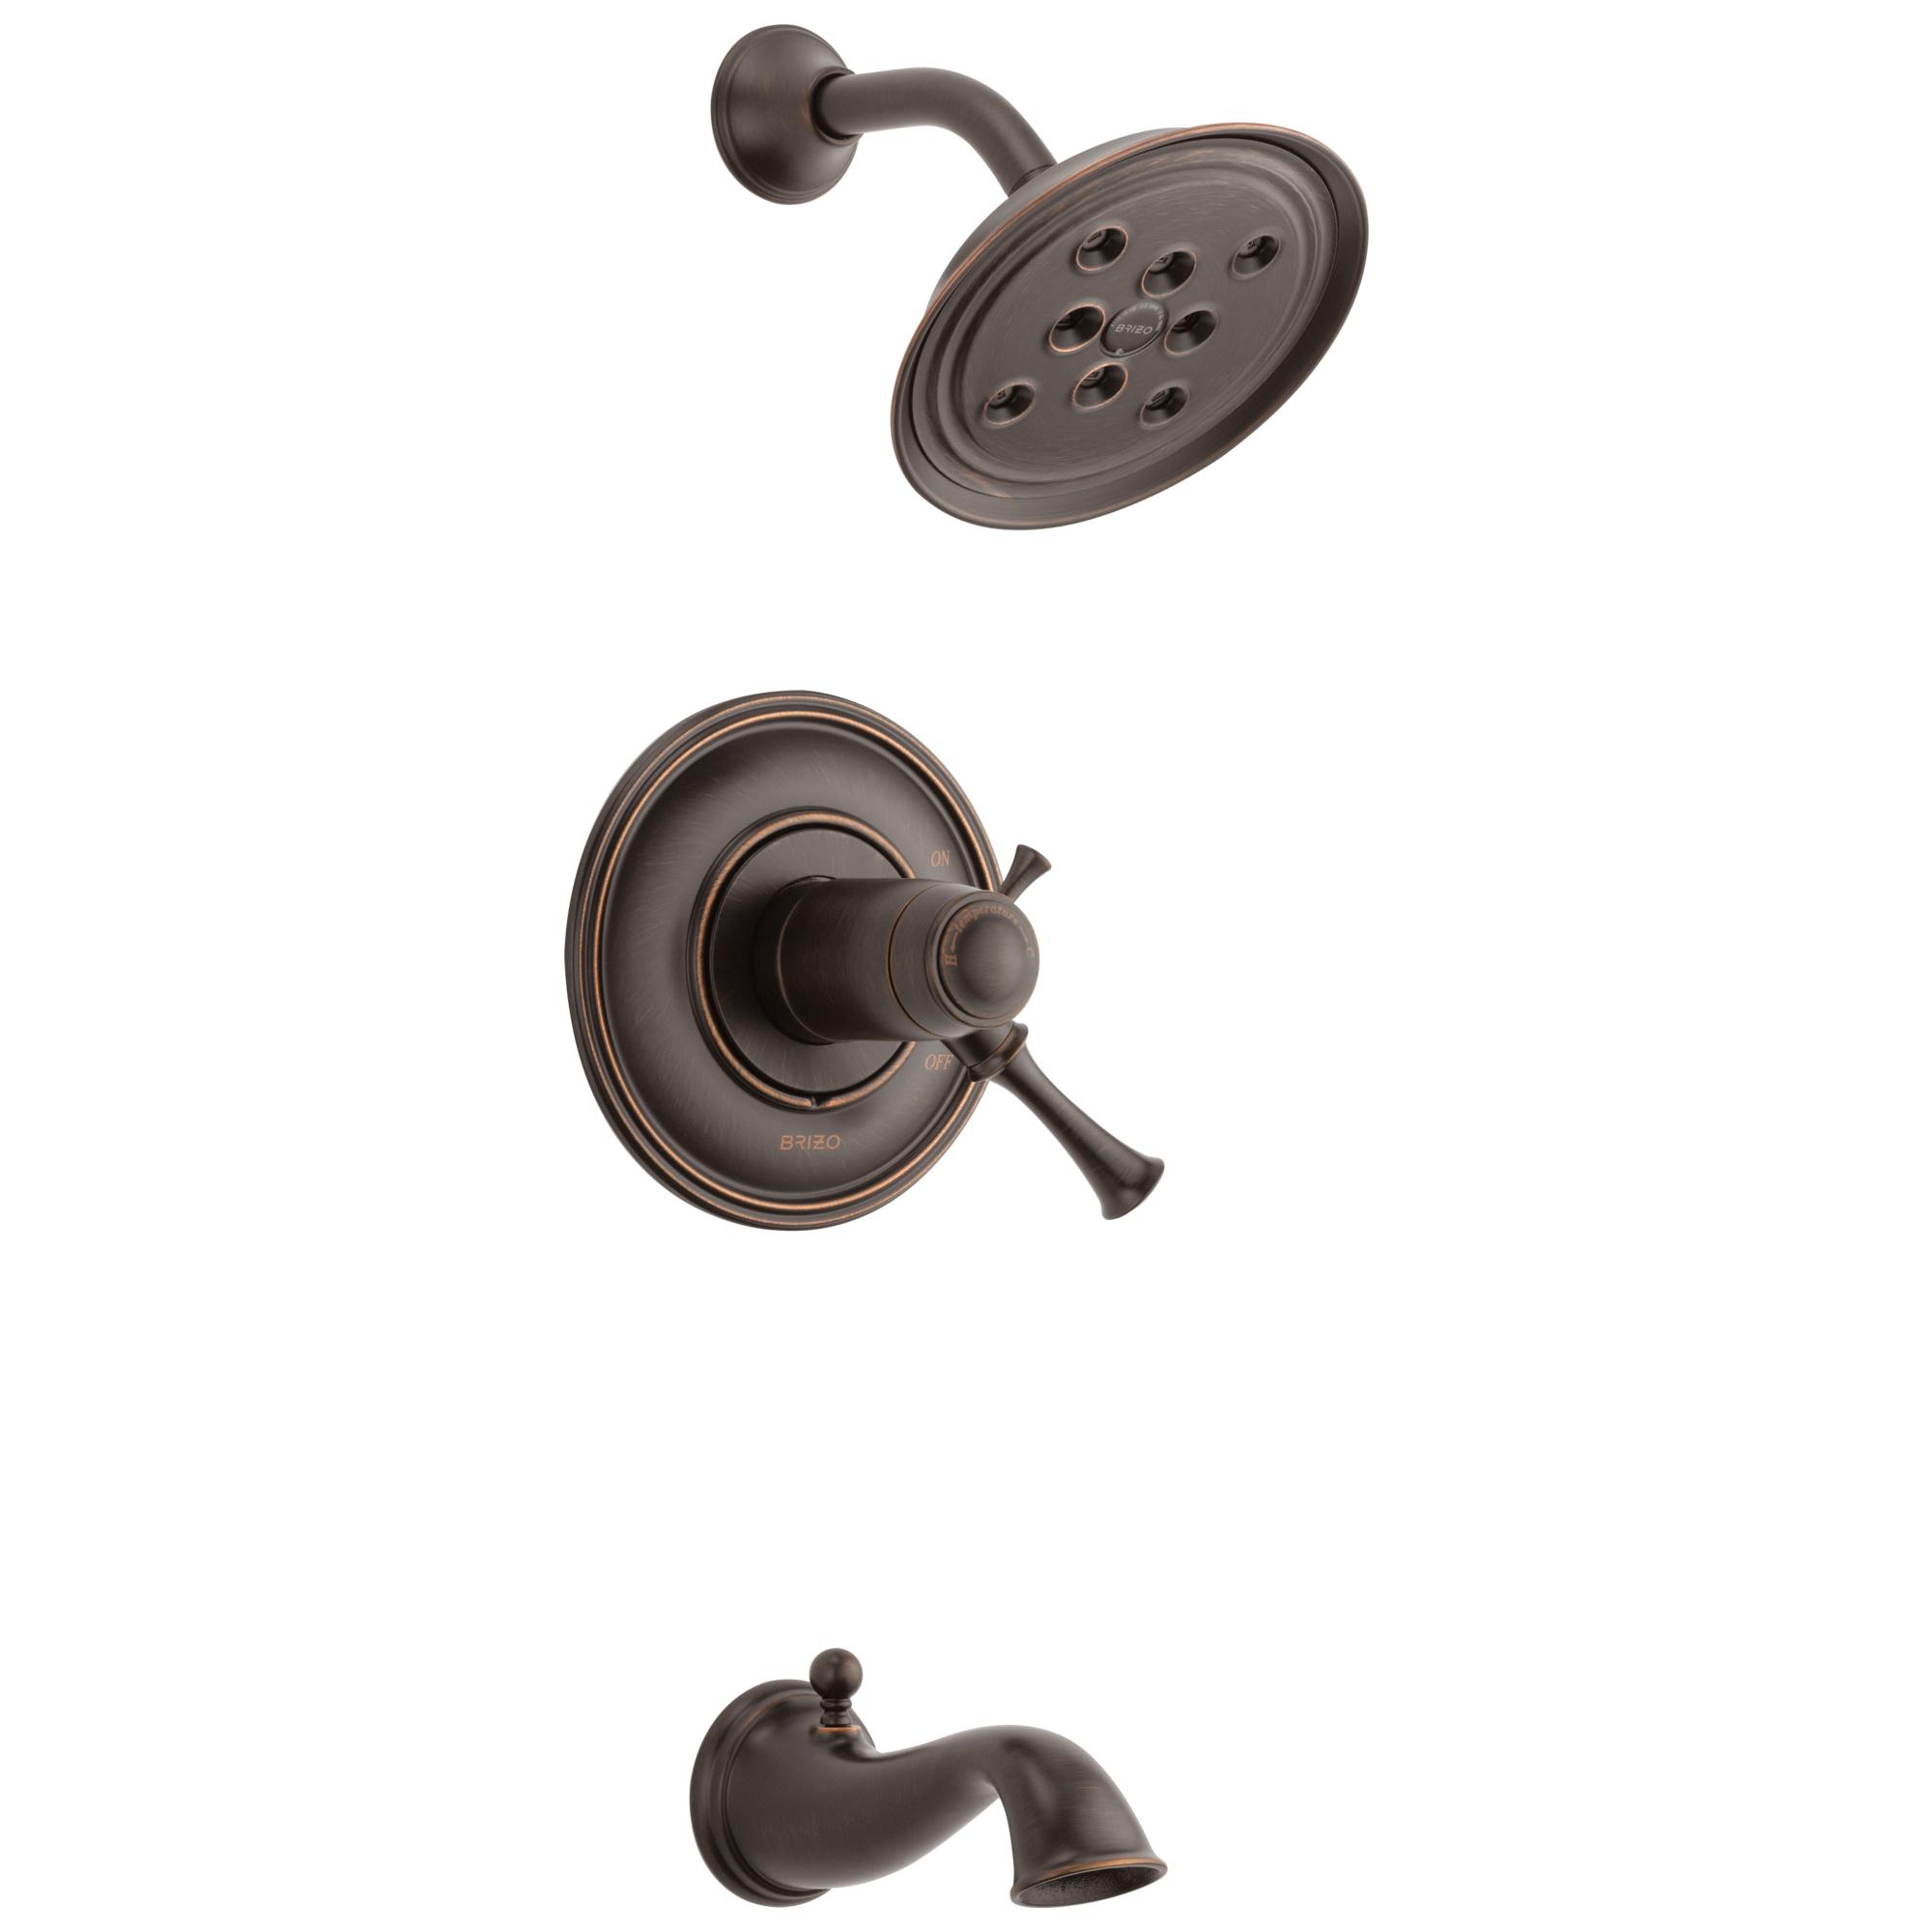 Brizo® T60405-RB TempAssure® Tub and Shower Faucet Trim, 2 gpm Shower, Venetian Bronze